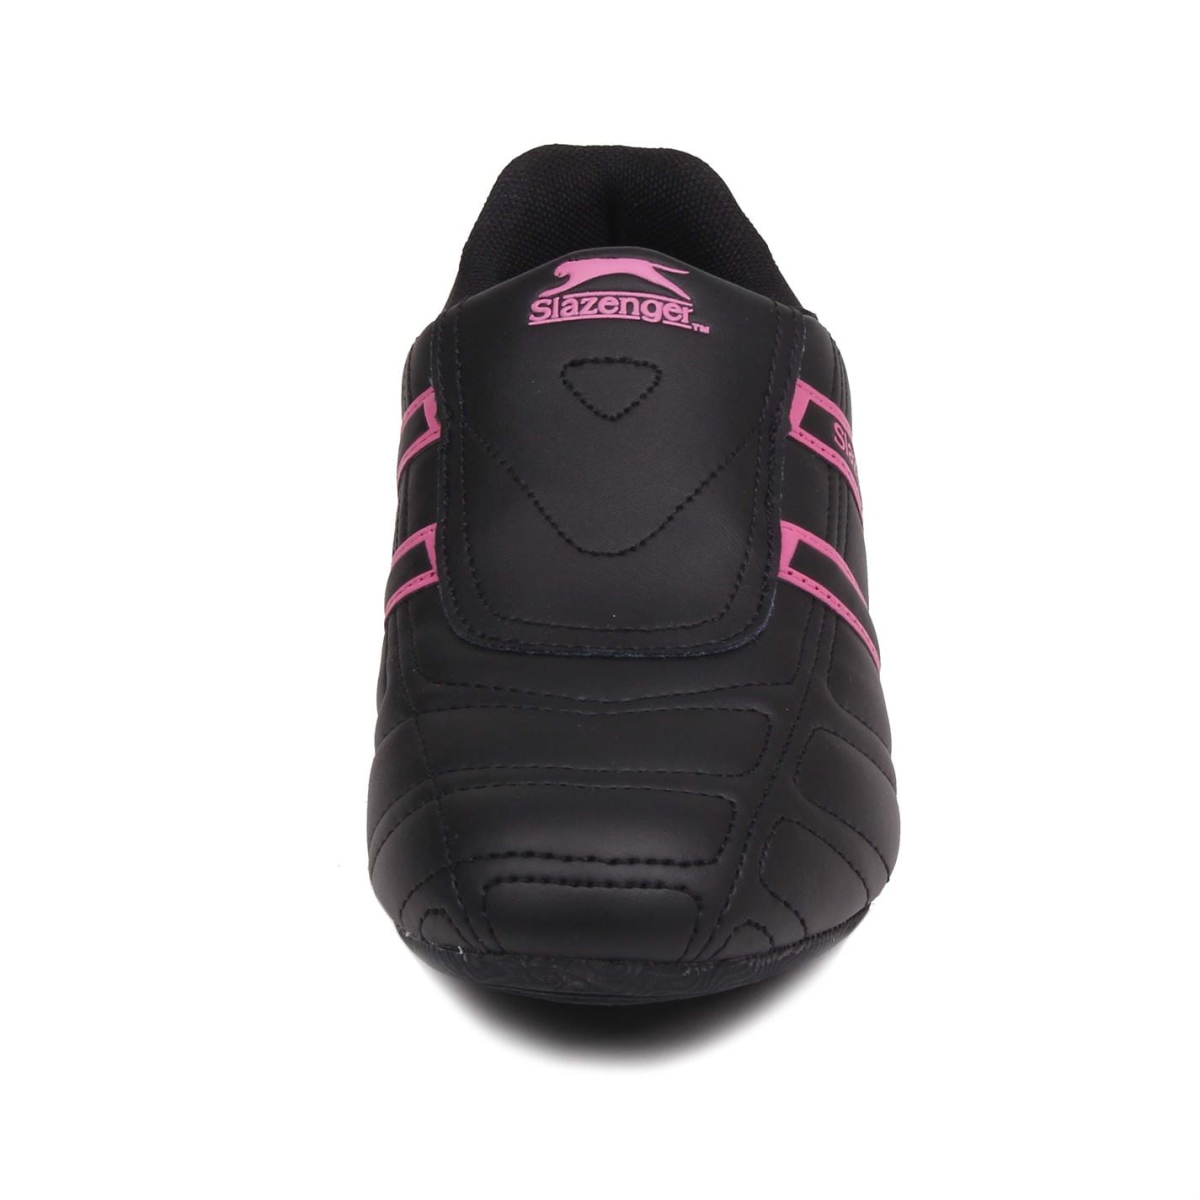 Slazenger-Turnschuhe-Damen-Sneaker-Sportschuhe-Laufschuhe-Warrior-5087 Indexbild 6